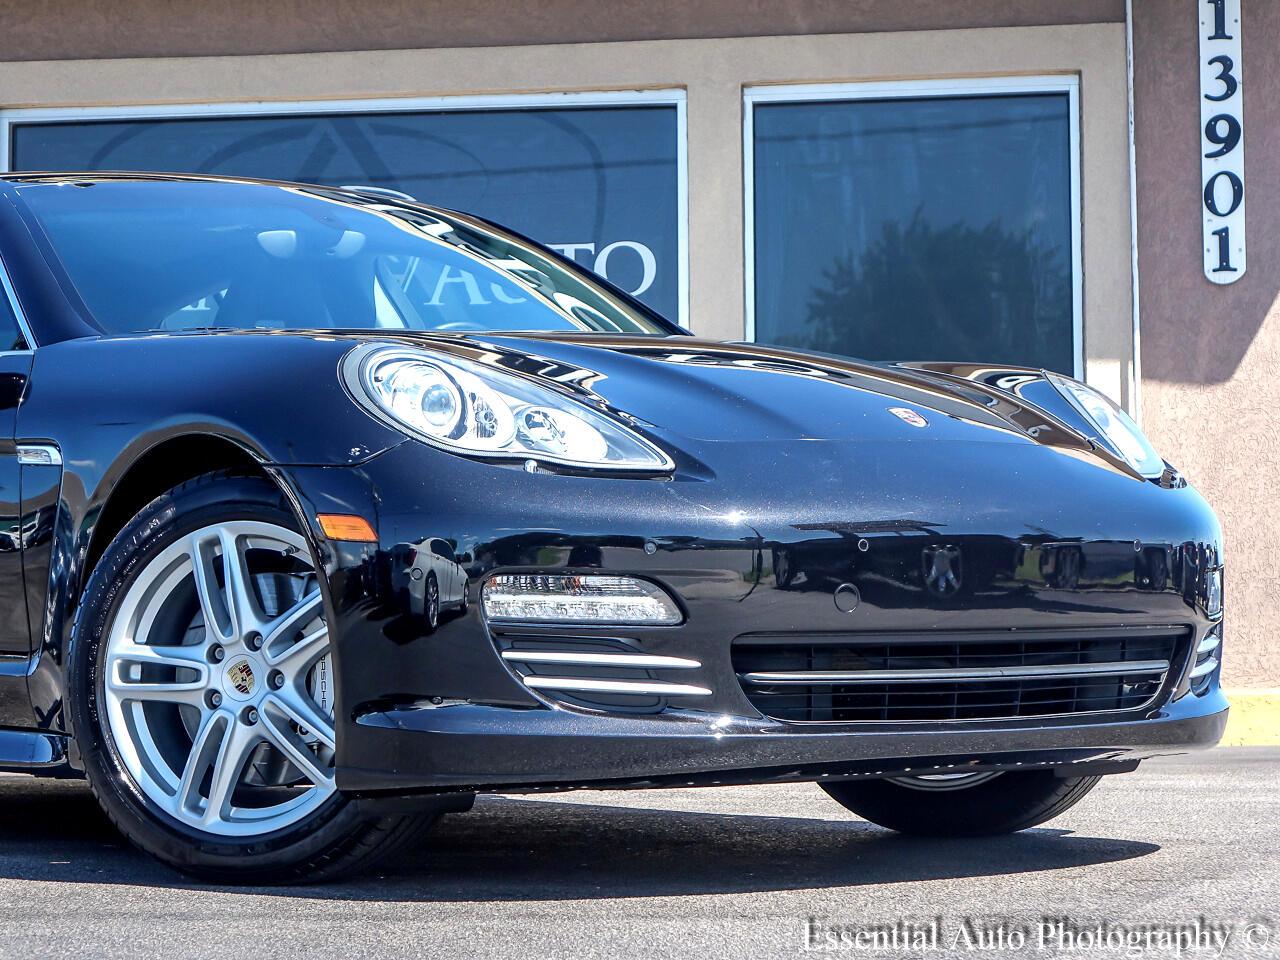 Porsche Panamera 4S 2010